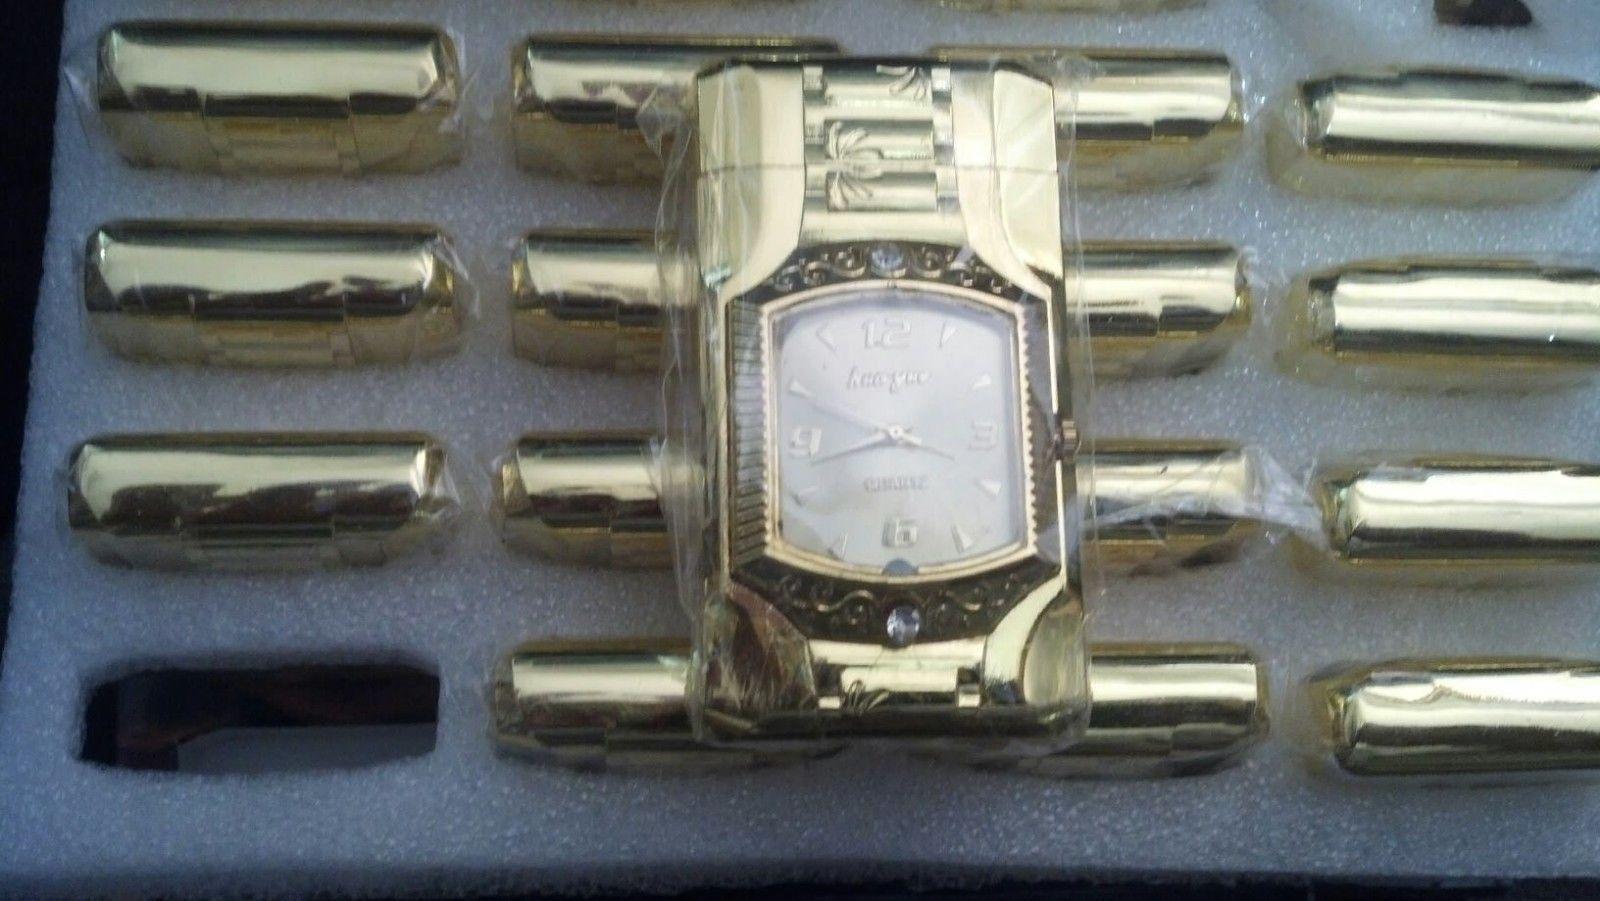 Luxurious Watch Cigarette Lighter Butane Gas Watch Lighter with LED Light - 1 pc